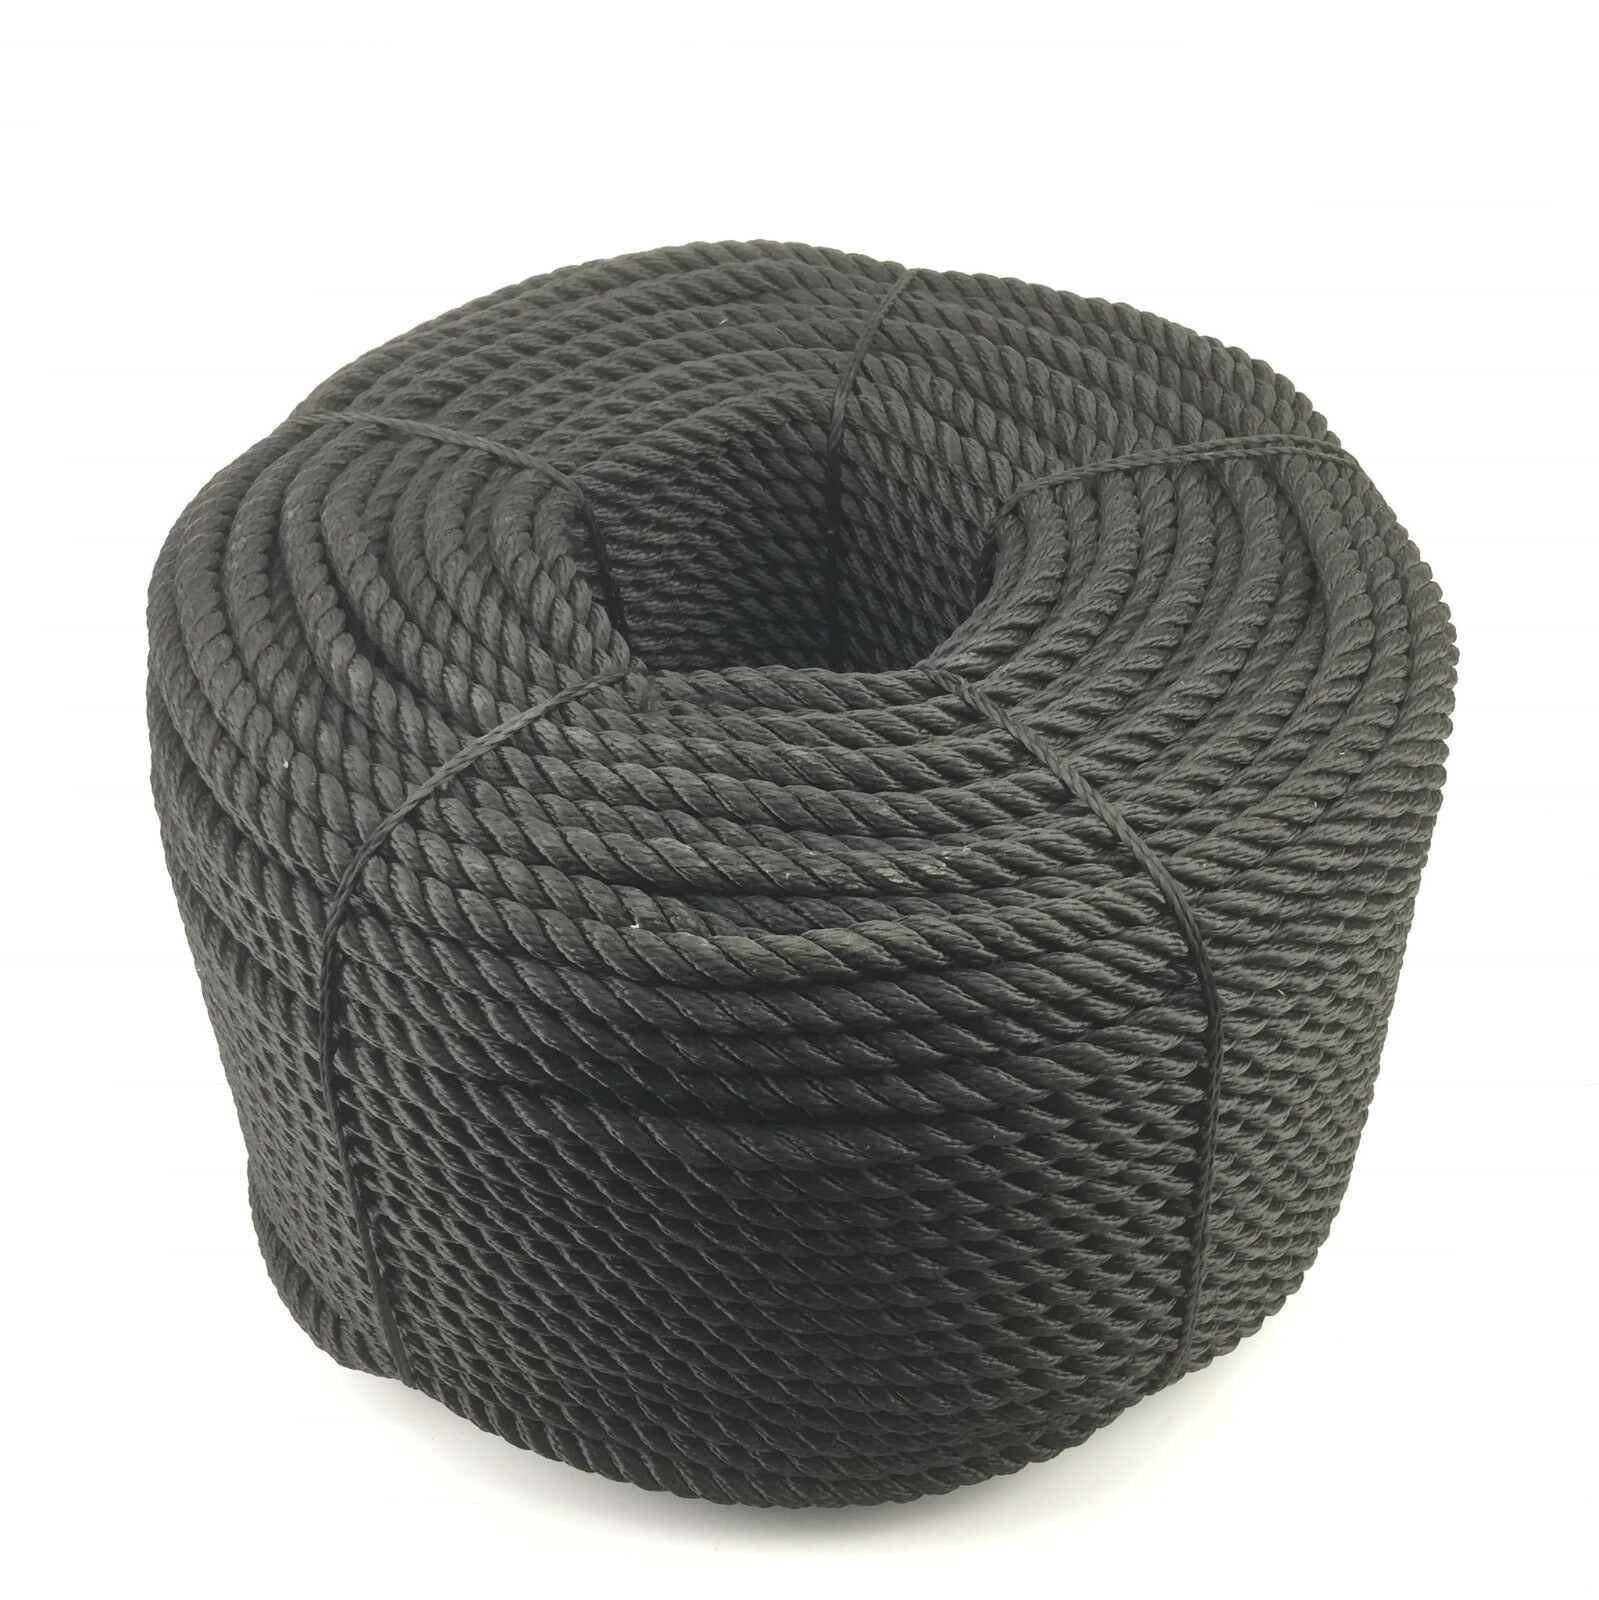 24mm Negro 3 filamentos Múltiple x 100 metres (Flotante (Flotante (Flotante Cuerda) SOFTLINE CUERDA 534992